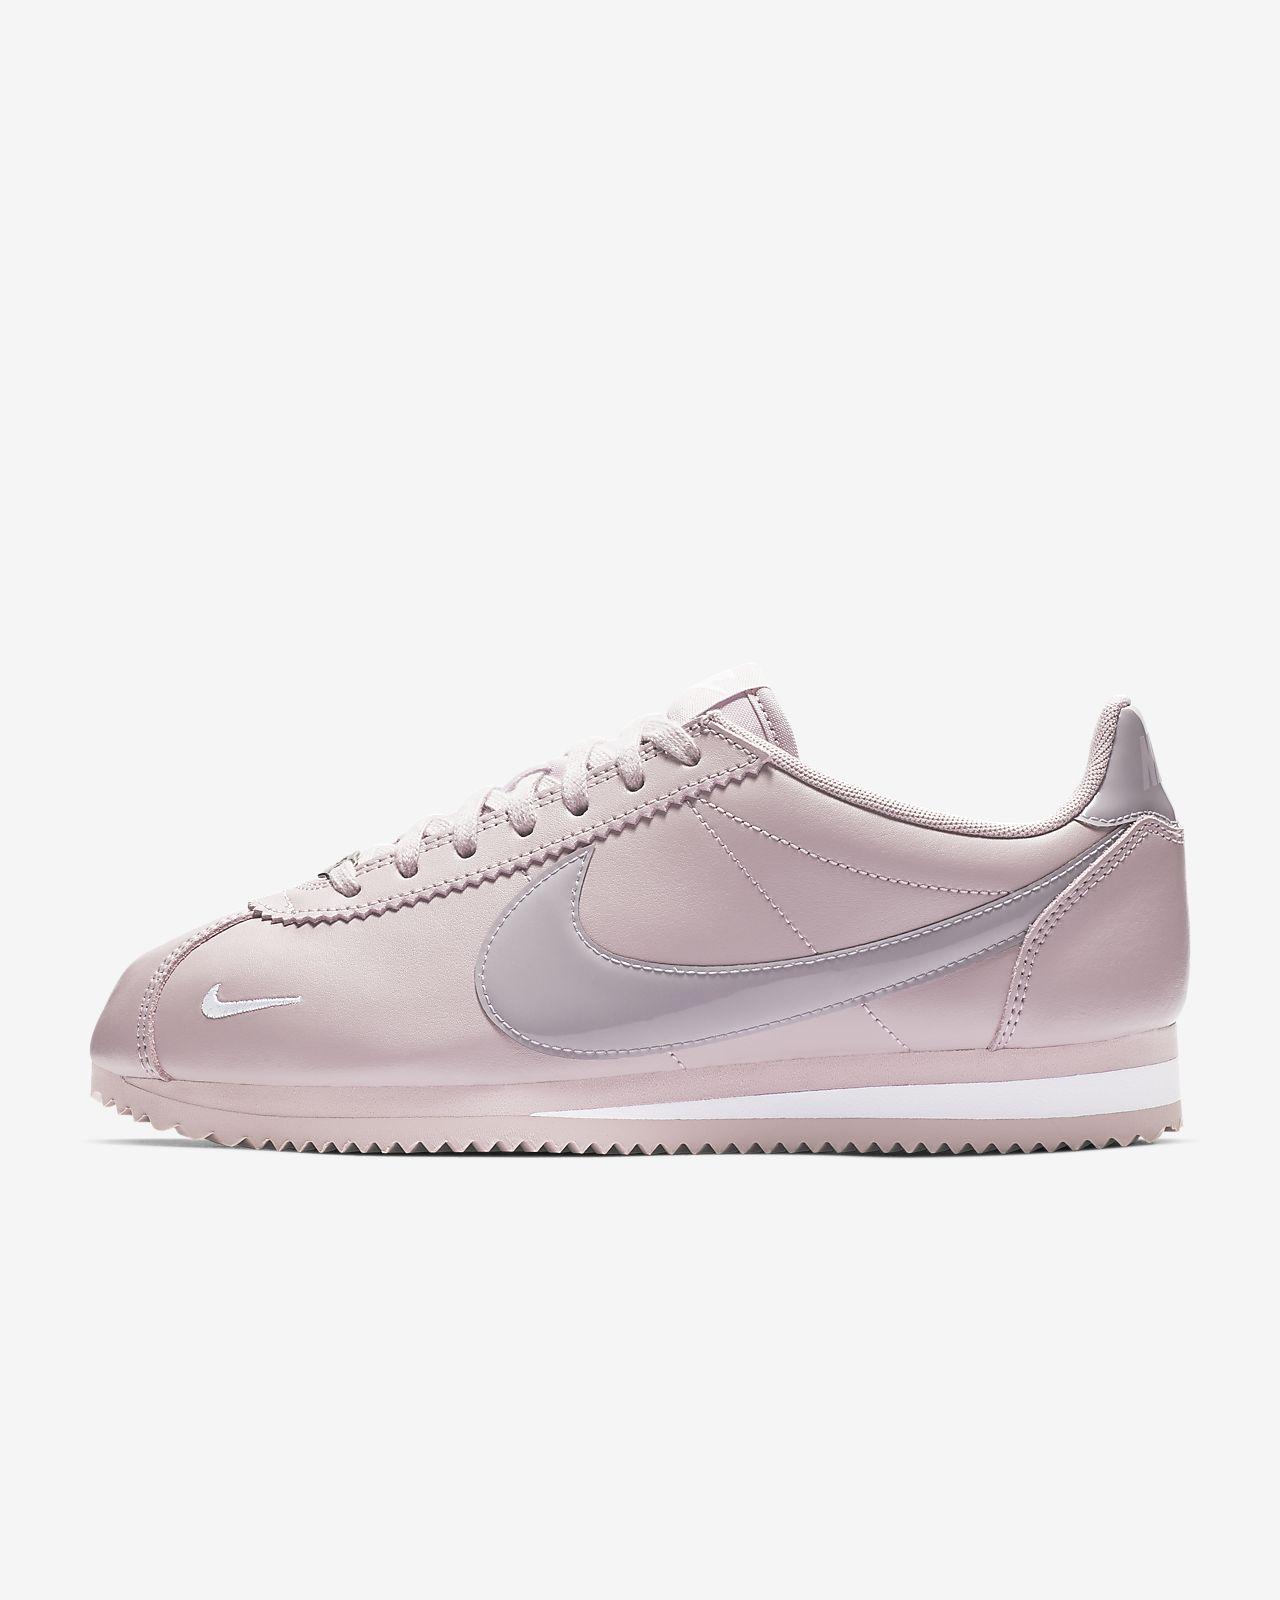 Premium Classic Femme Pour Be Cortez Nike Chaussure ZfFqxwSaW